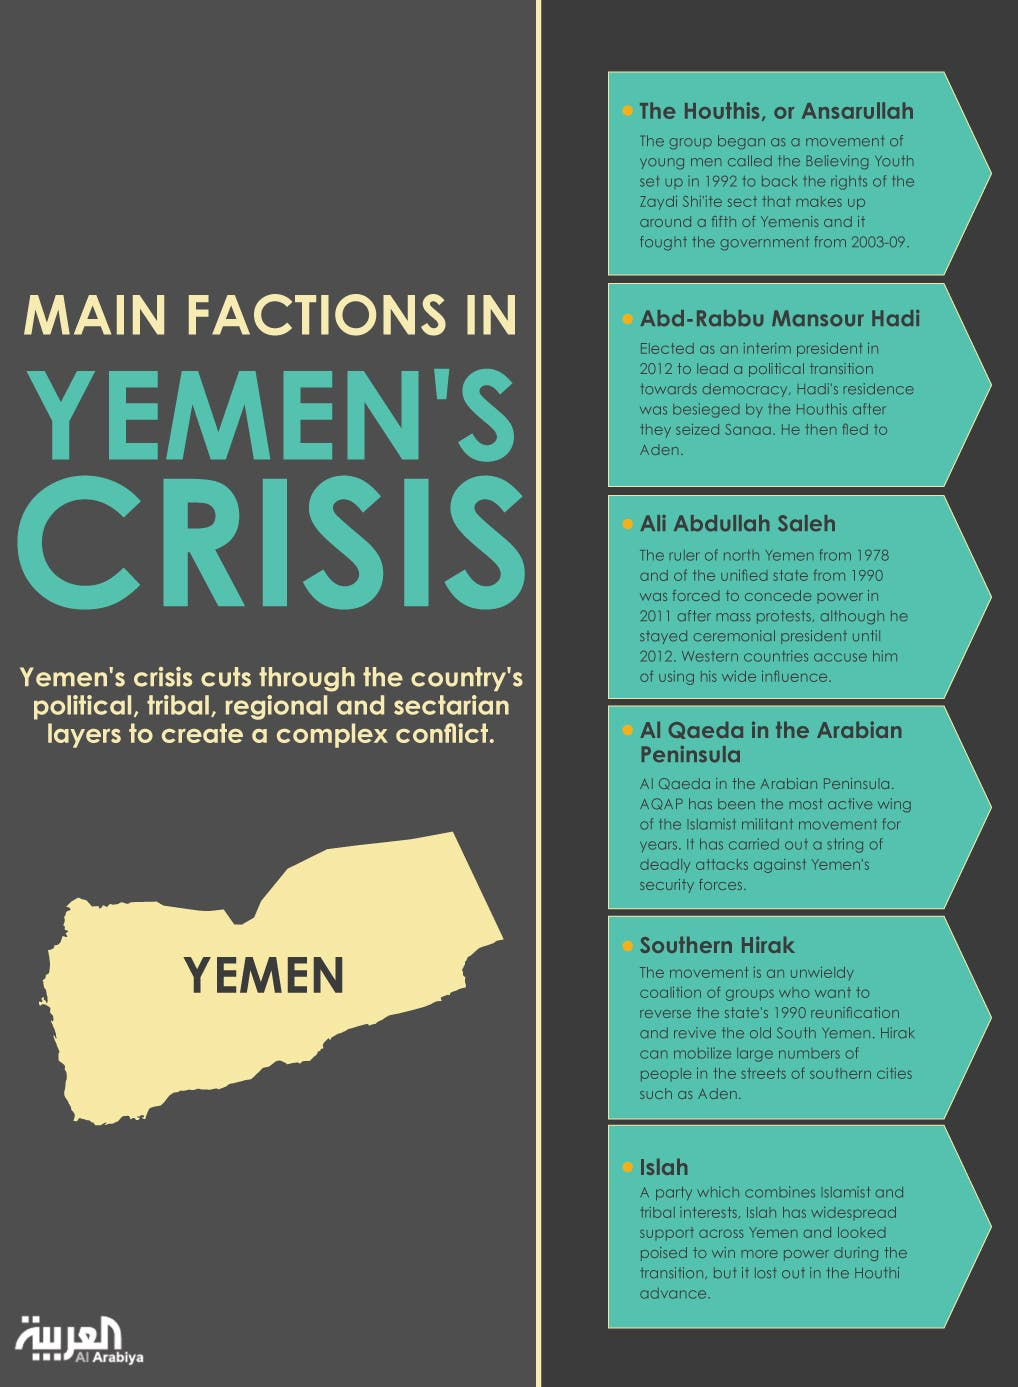 Infographic: Main factions in Yemen's cisis